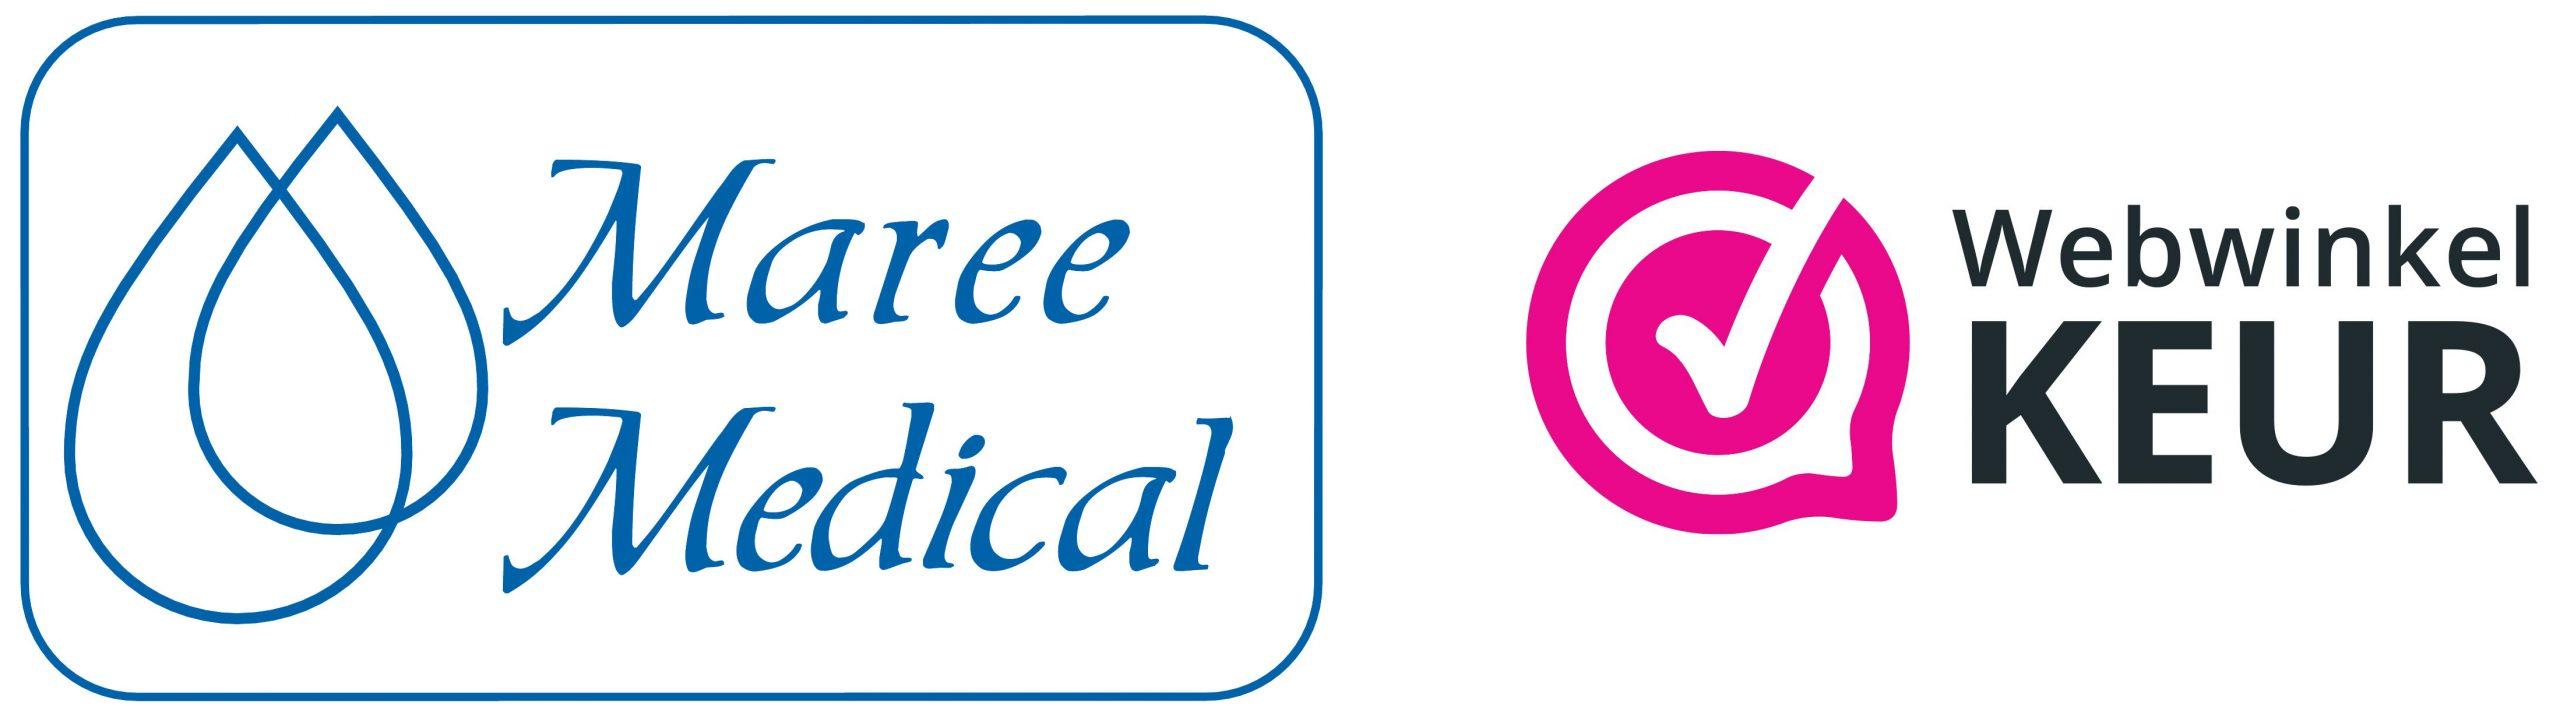 Maree Medical International